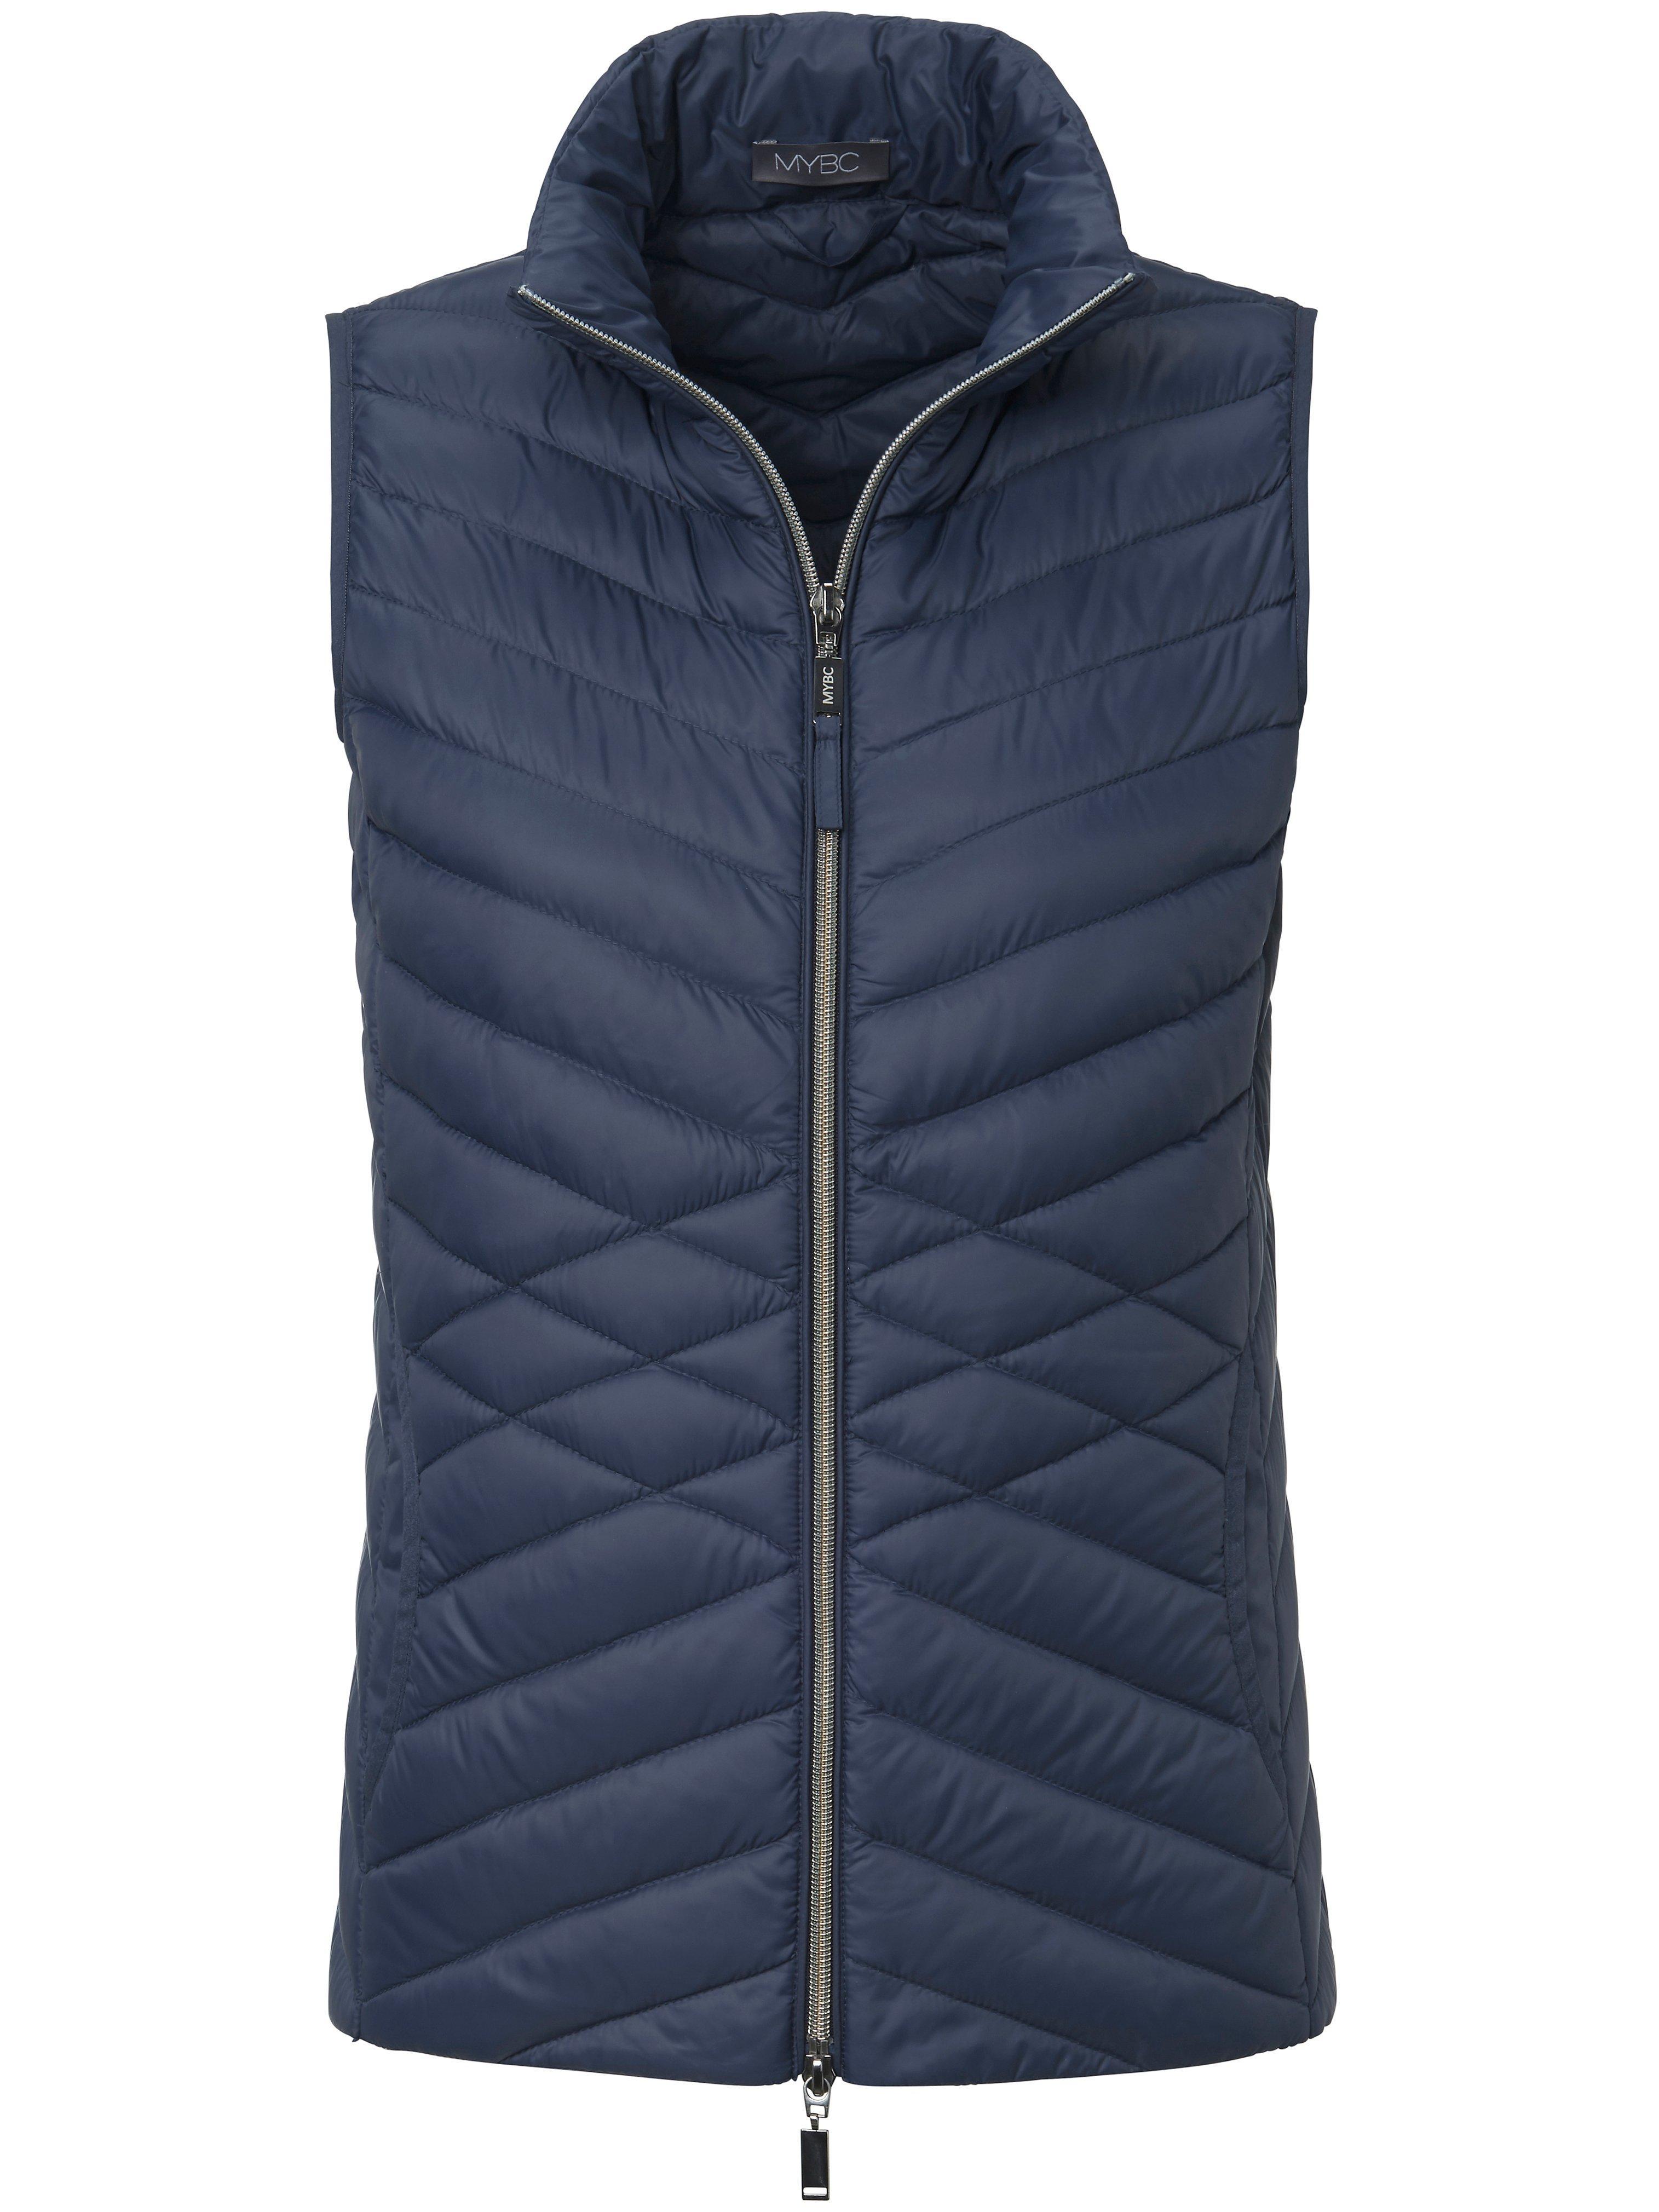 Damen Daunen-Steppweste MYBC blau | Plus Size |